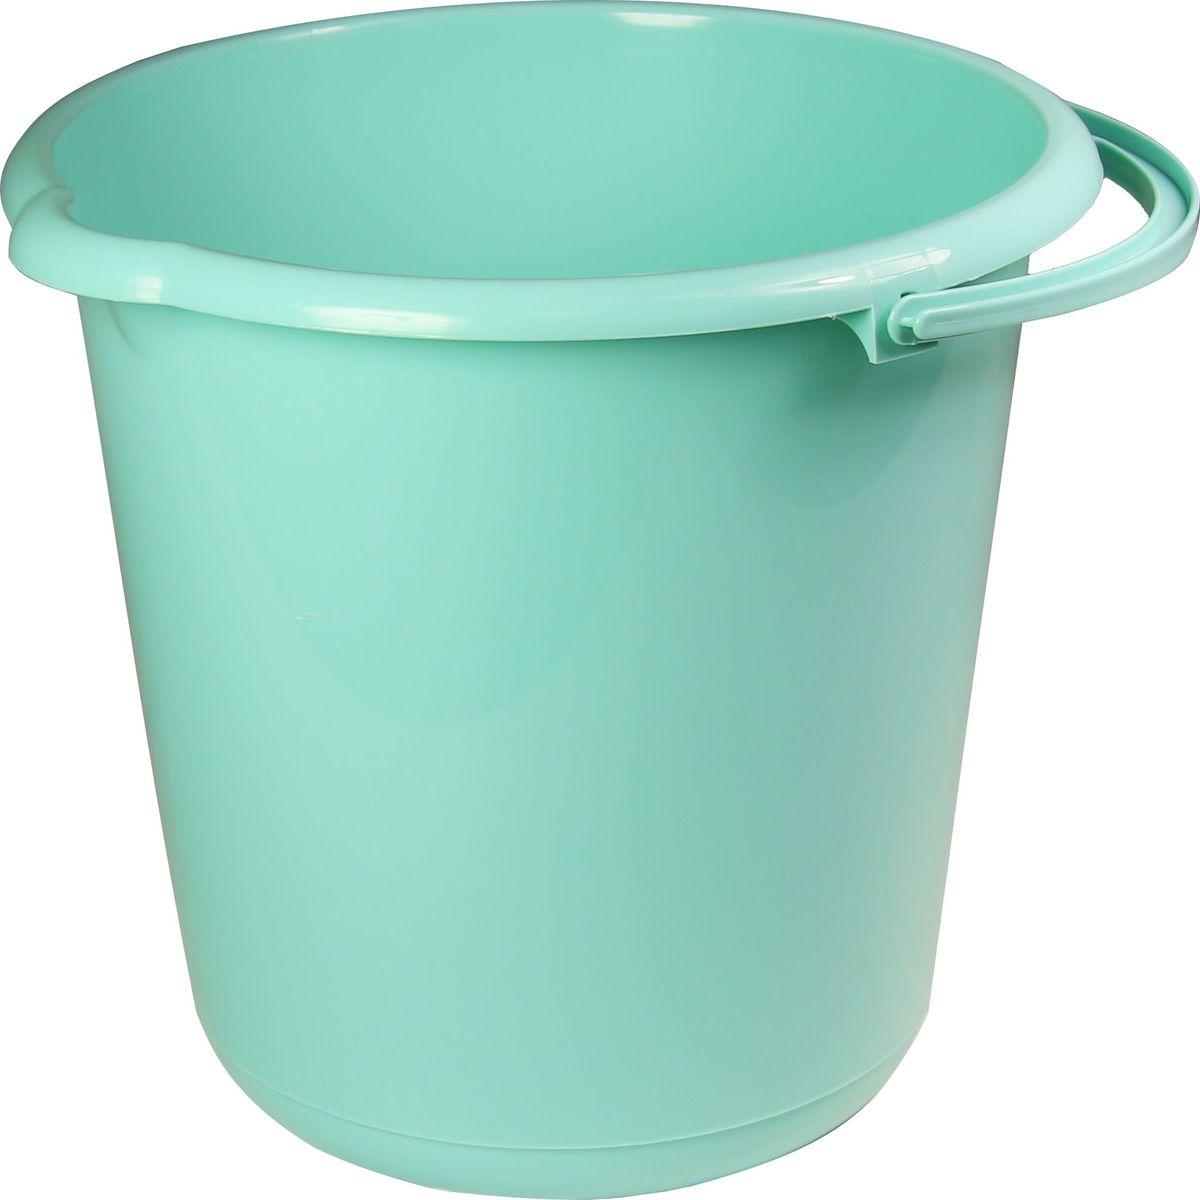 Ведро хозяйственное Idea, цвет: аквамарин, 15 л. М 2431М 2431_аквамарин